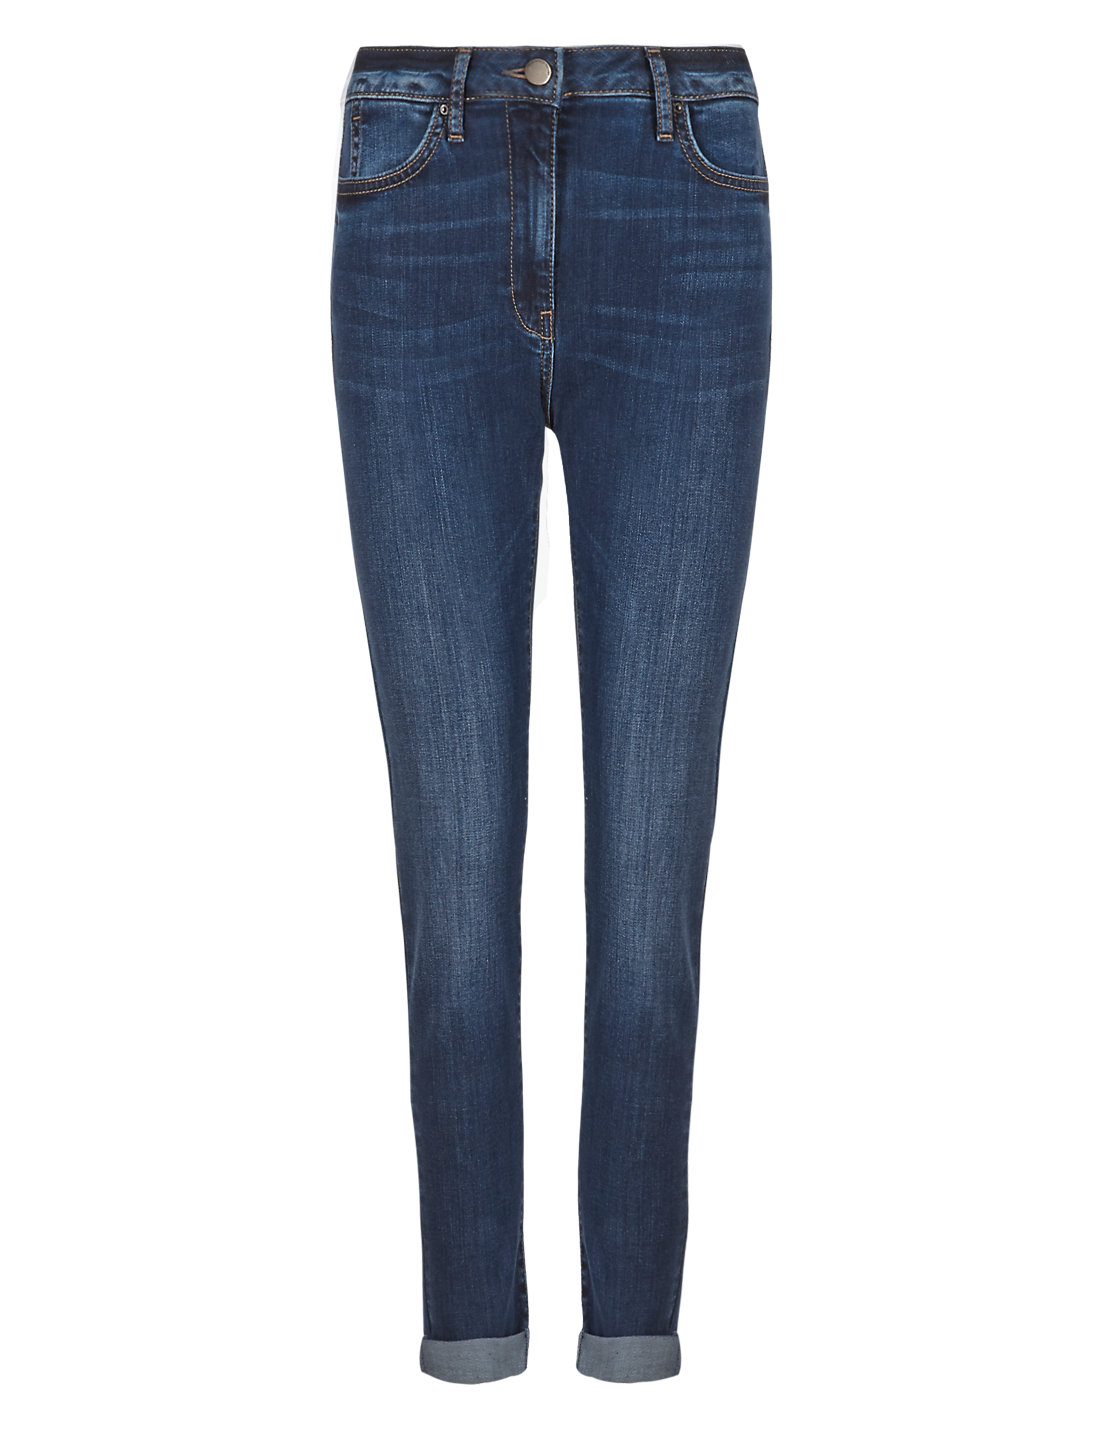 Denim Jeans Skinny - Xtellar Jeans